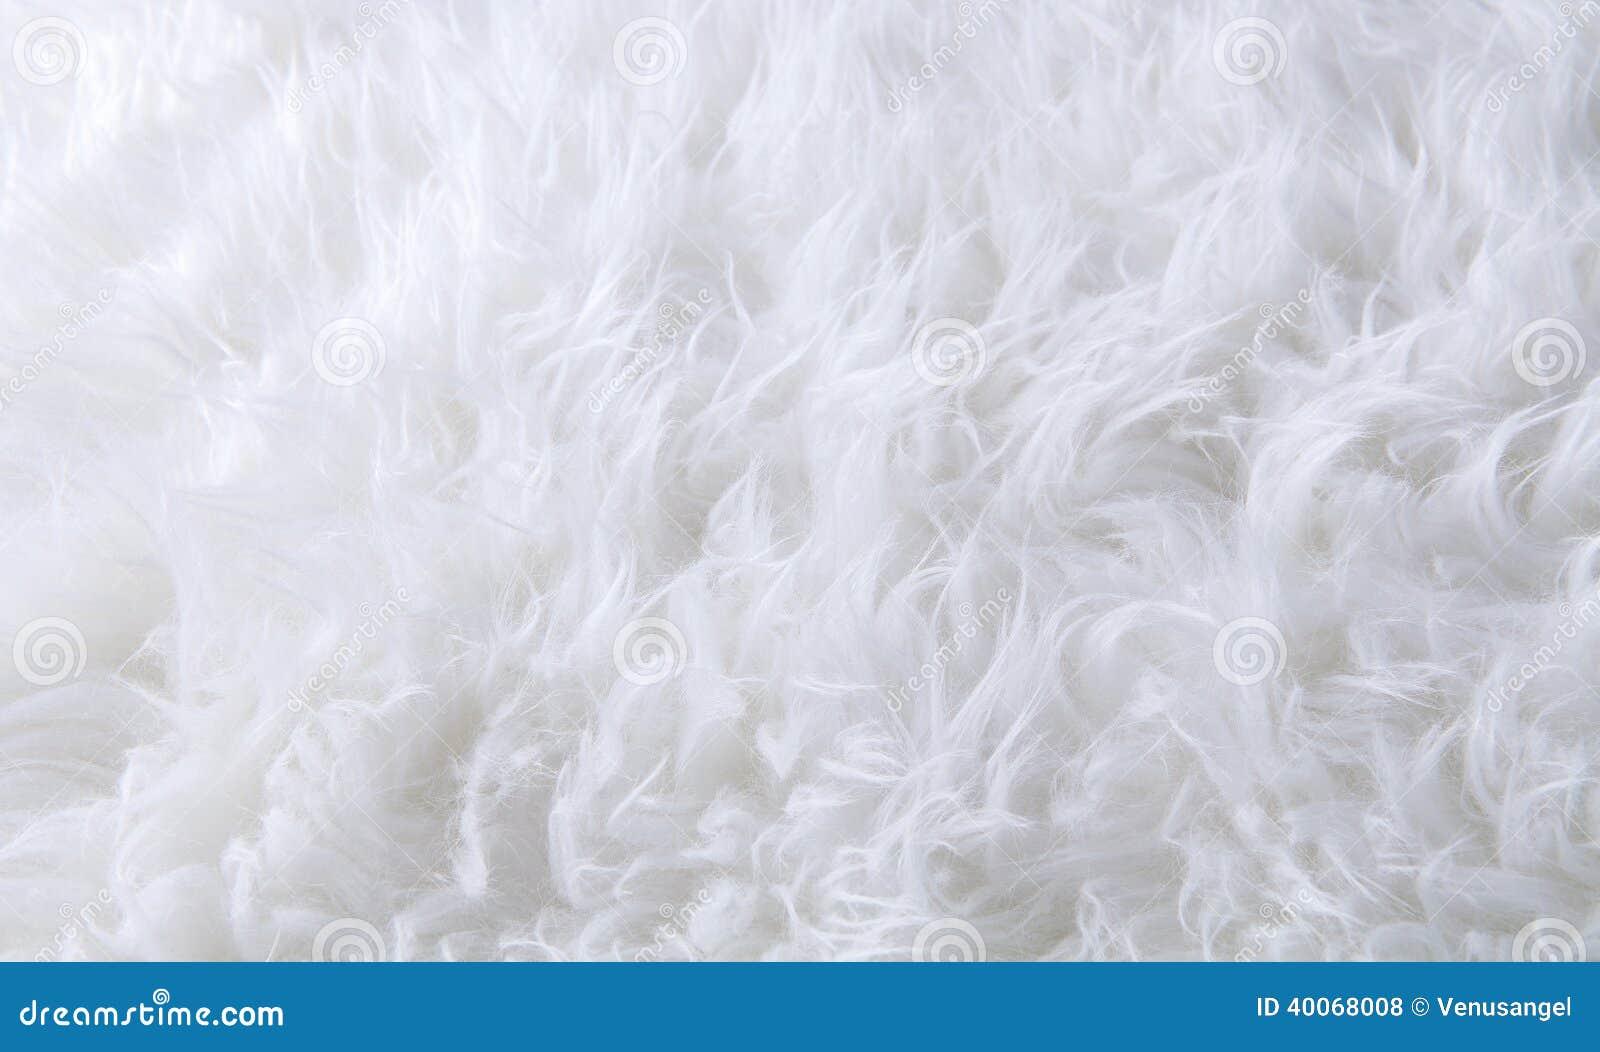 Texture Of Fur Carpet Stock Photo Image 40068008